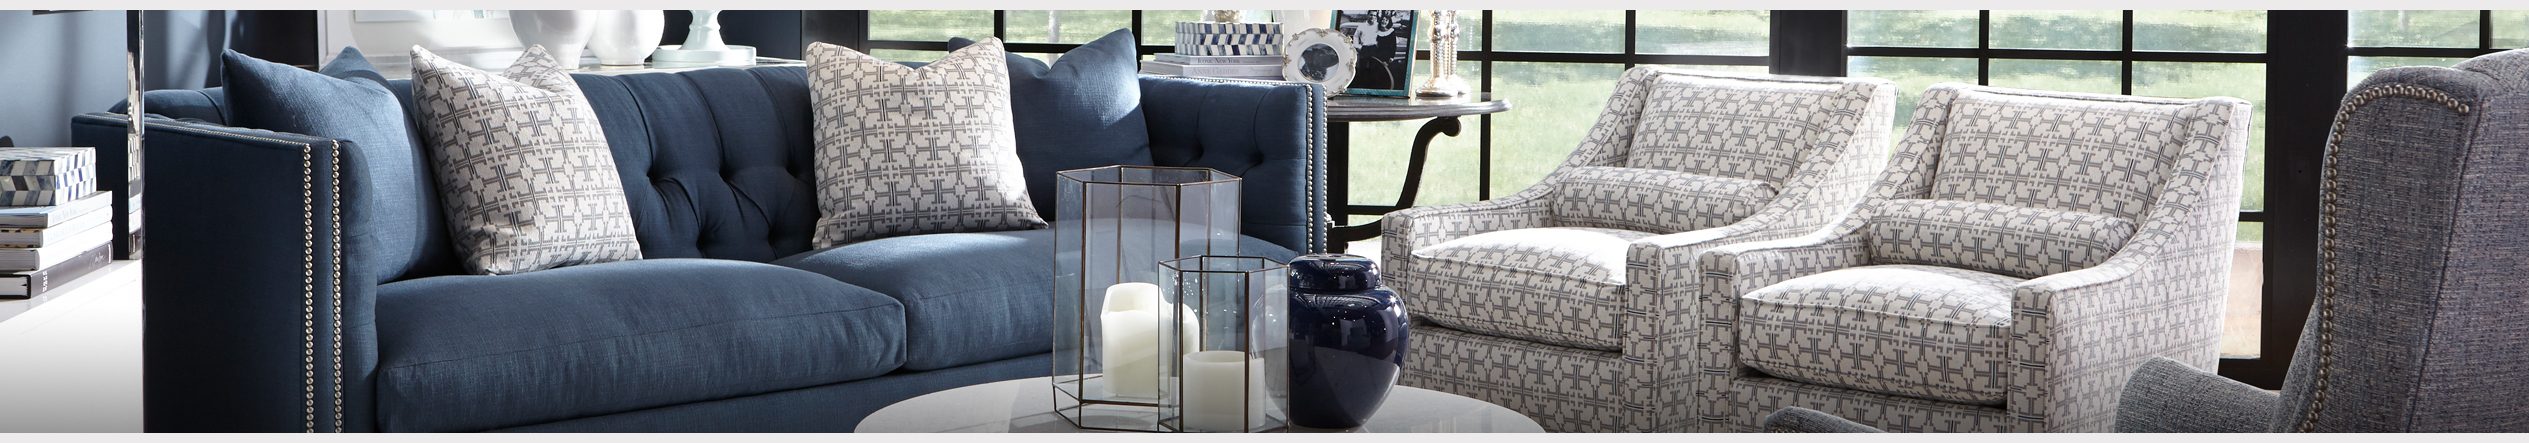 Furniture Care at Jordan's Furniture stores in CT, MA, NH, and RI